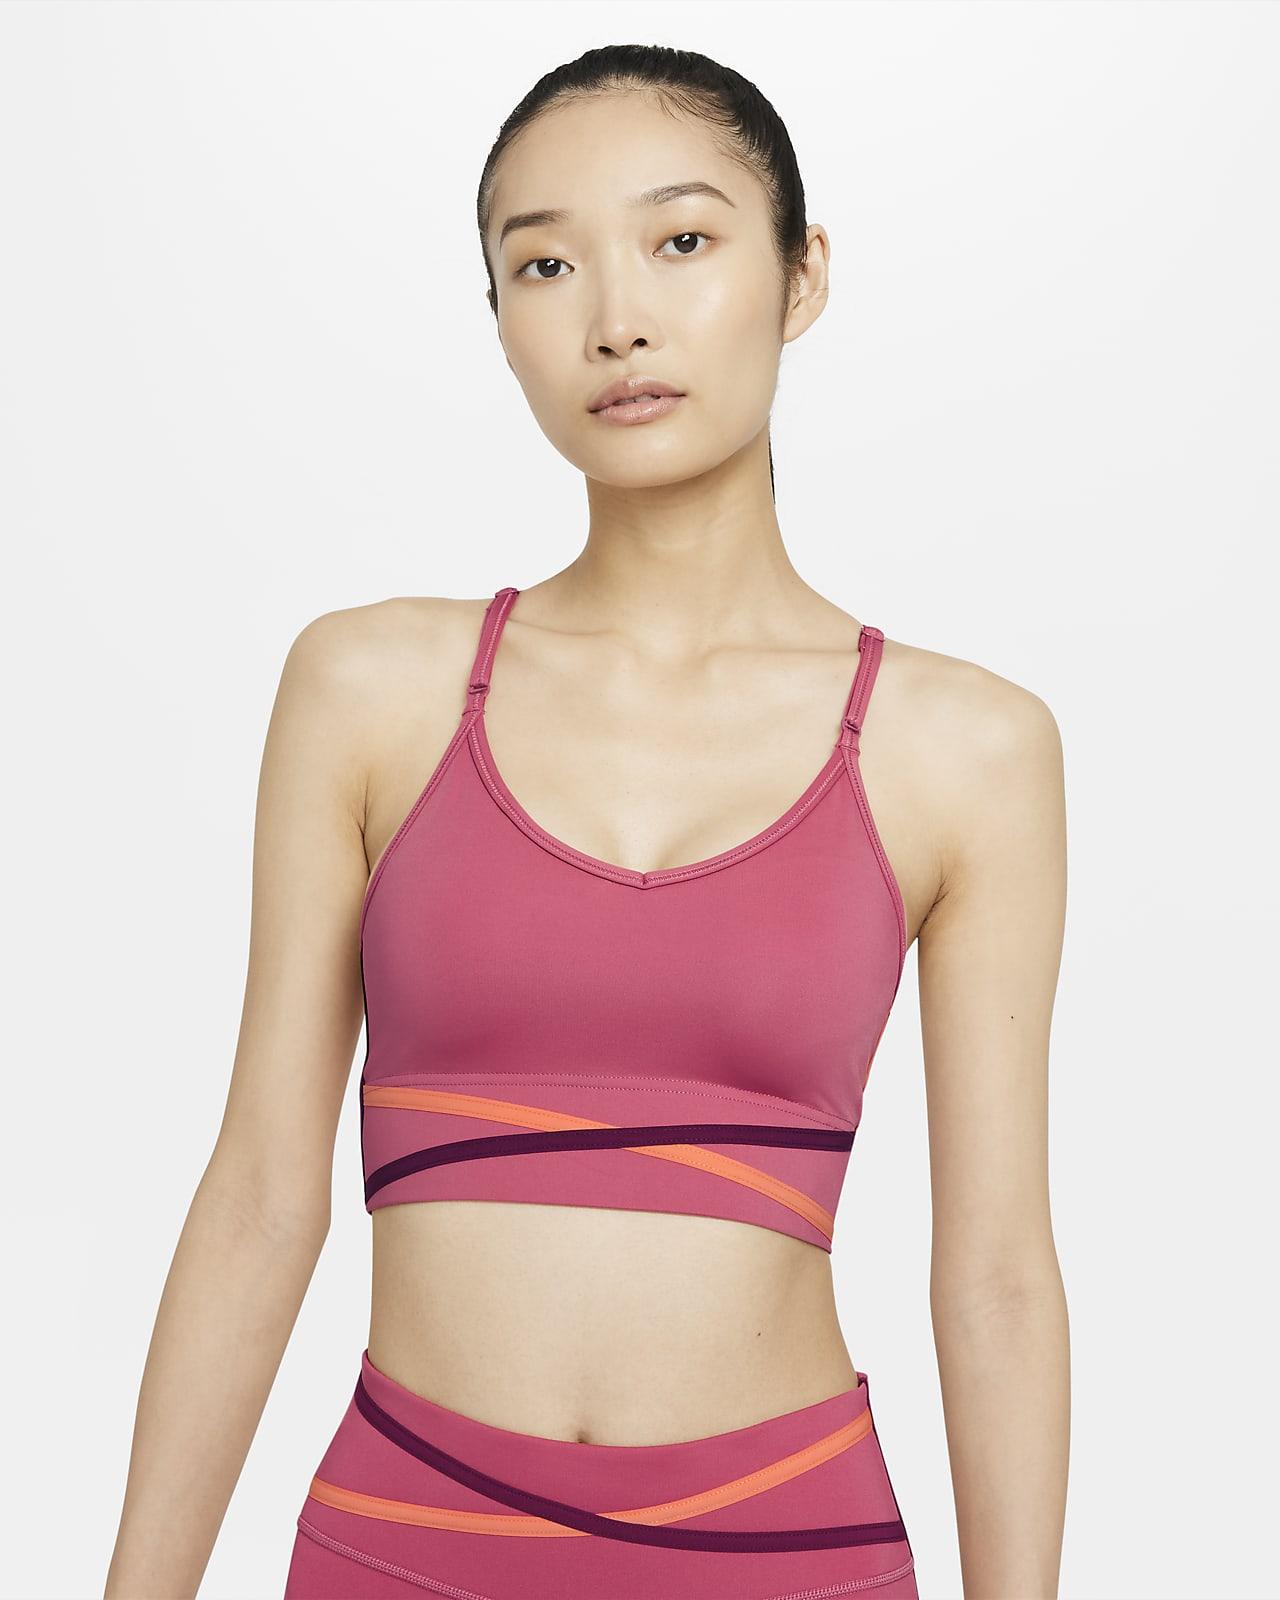 Nike Dri-FIT Indy Women's Light-Support Padded Longline Sports Bra